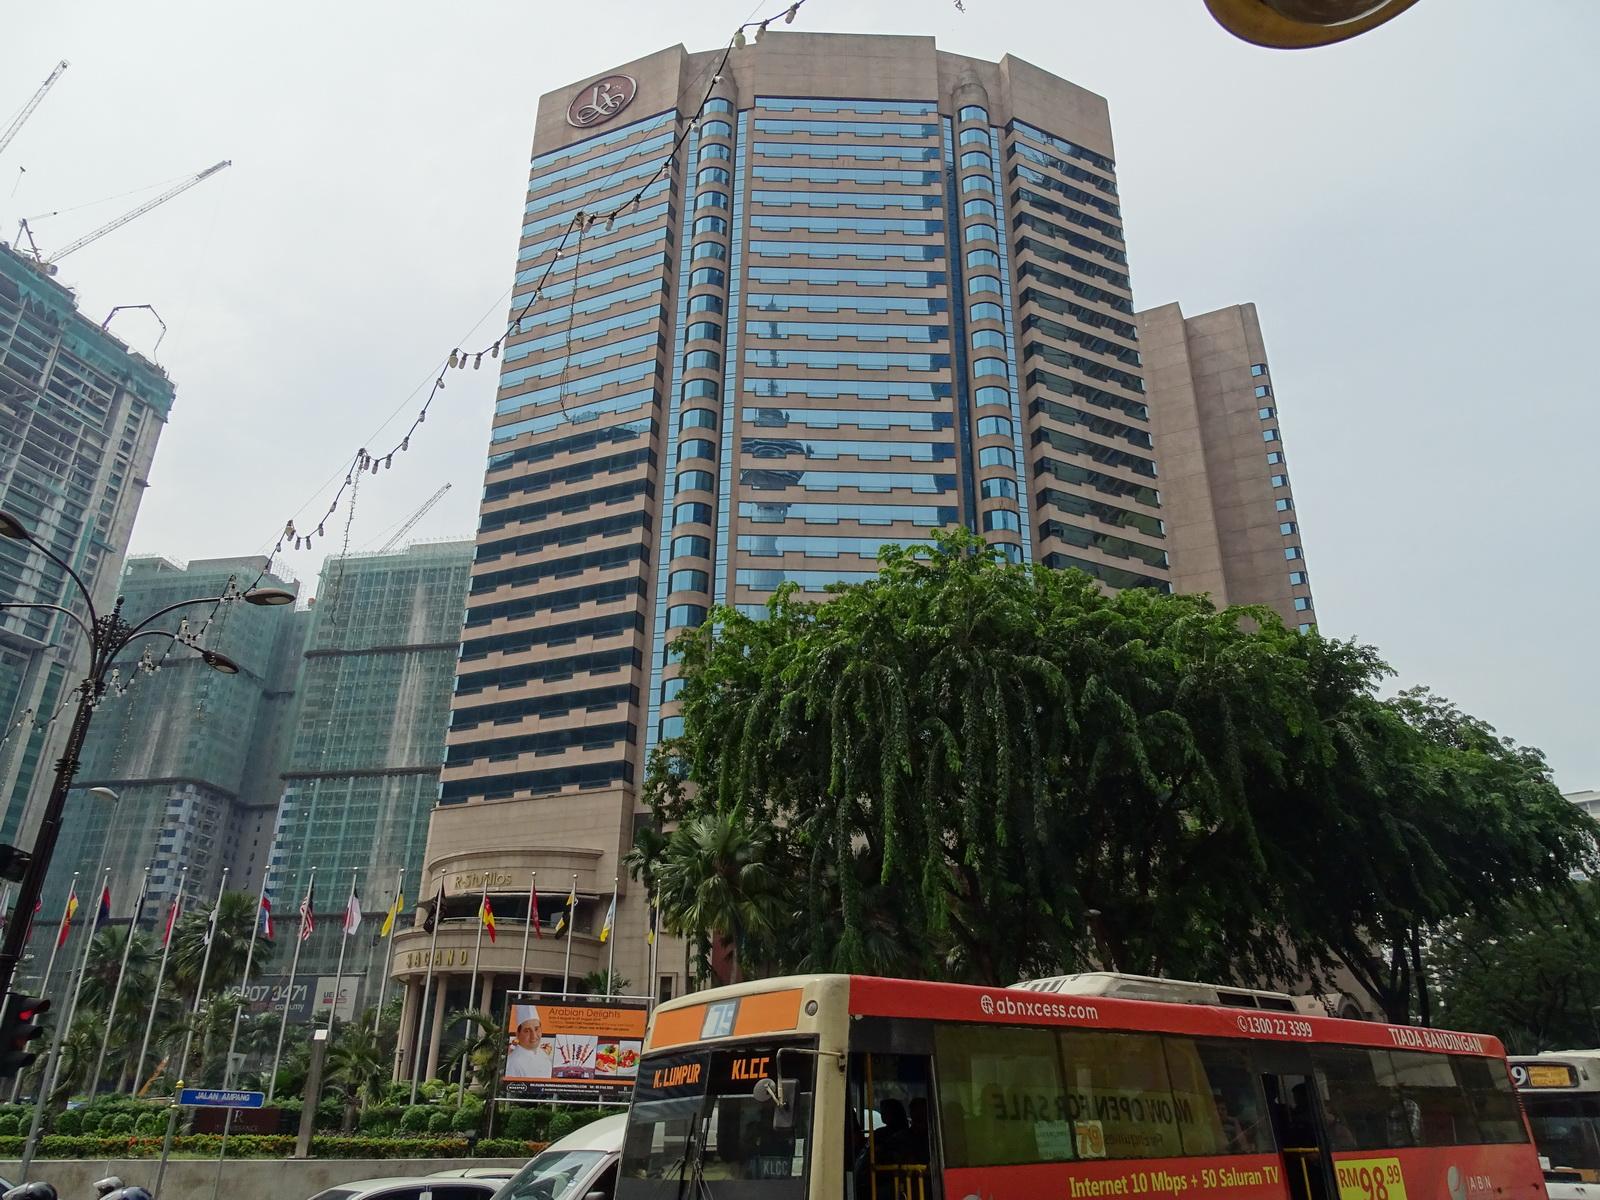 05 KL Tower 52